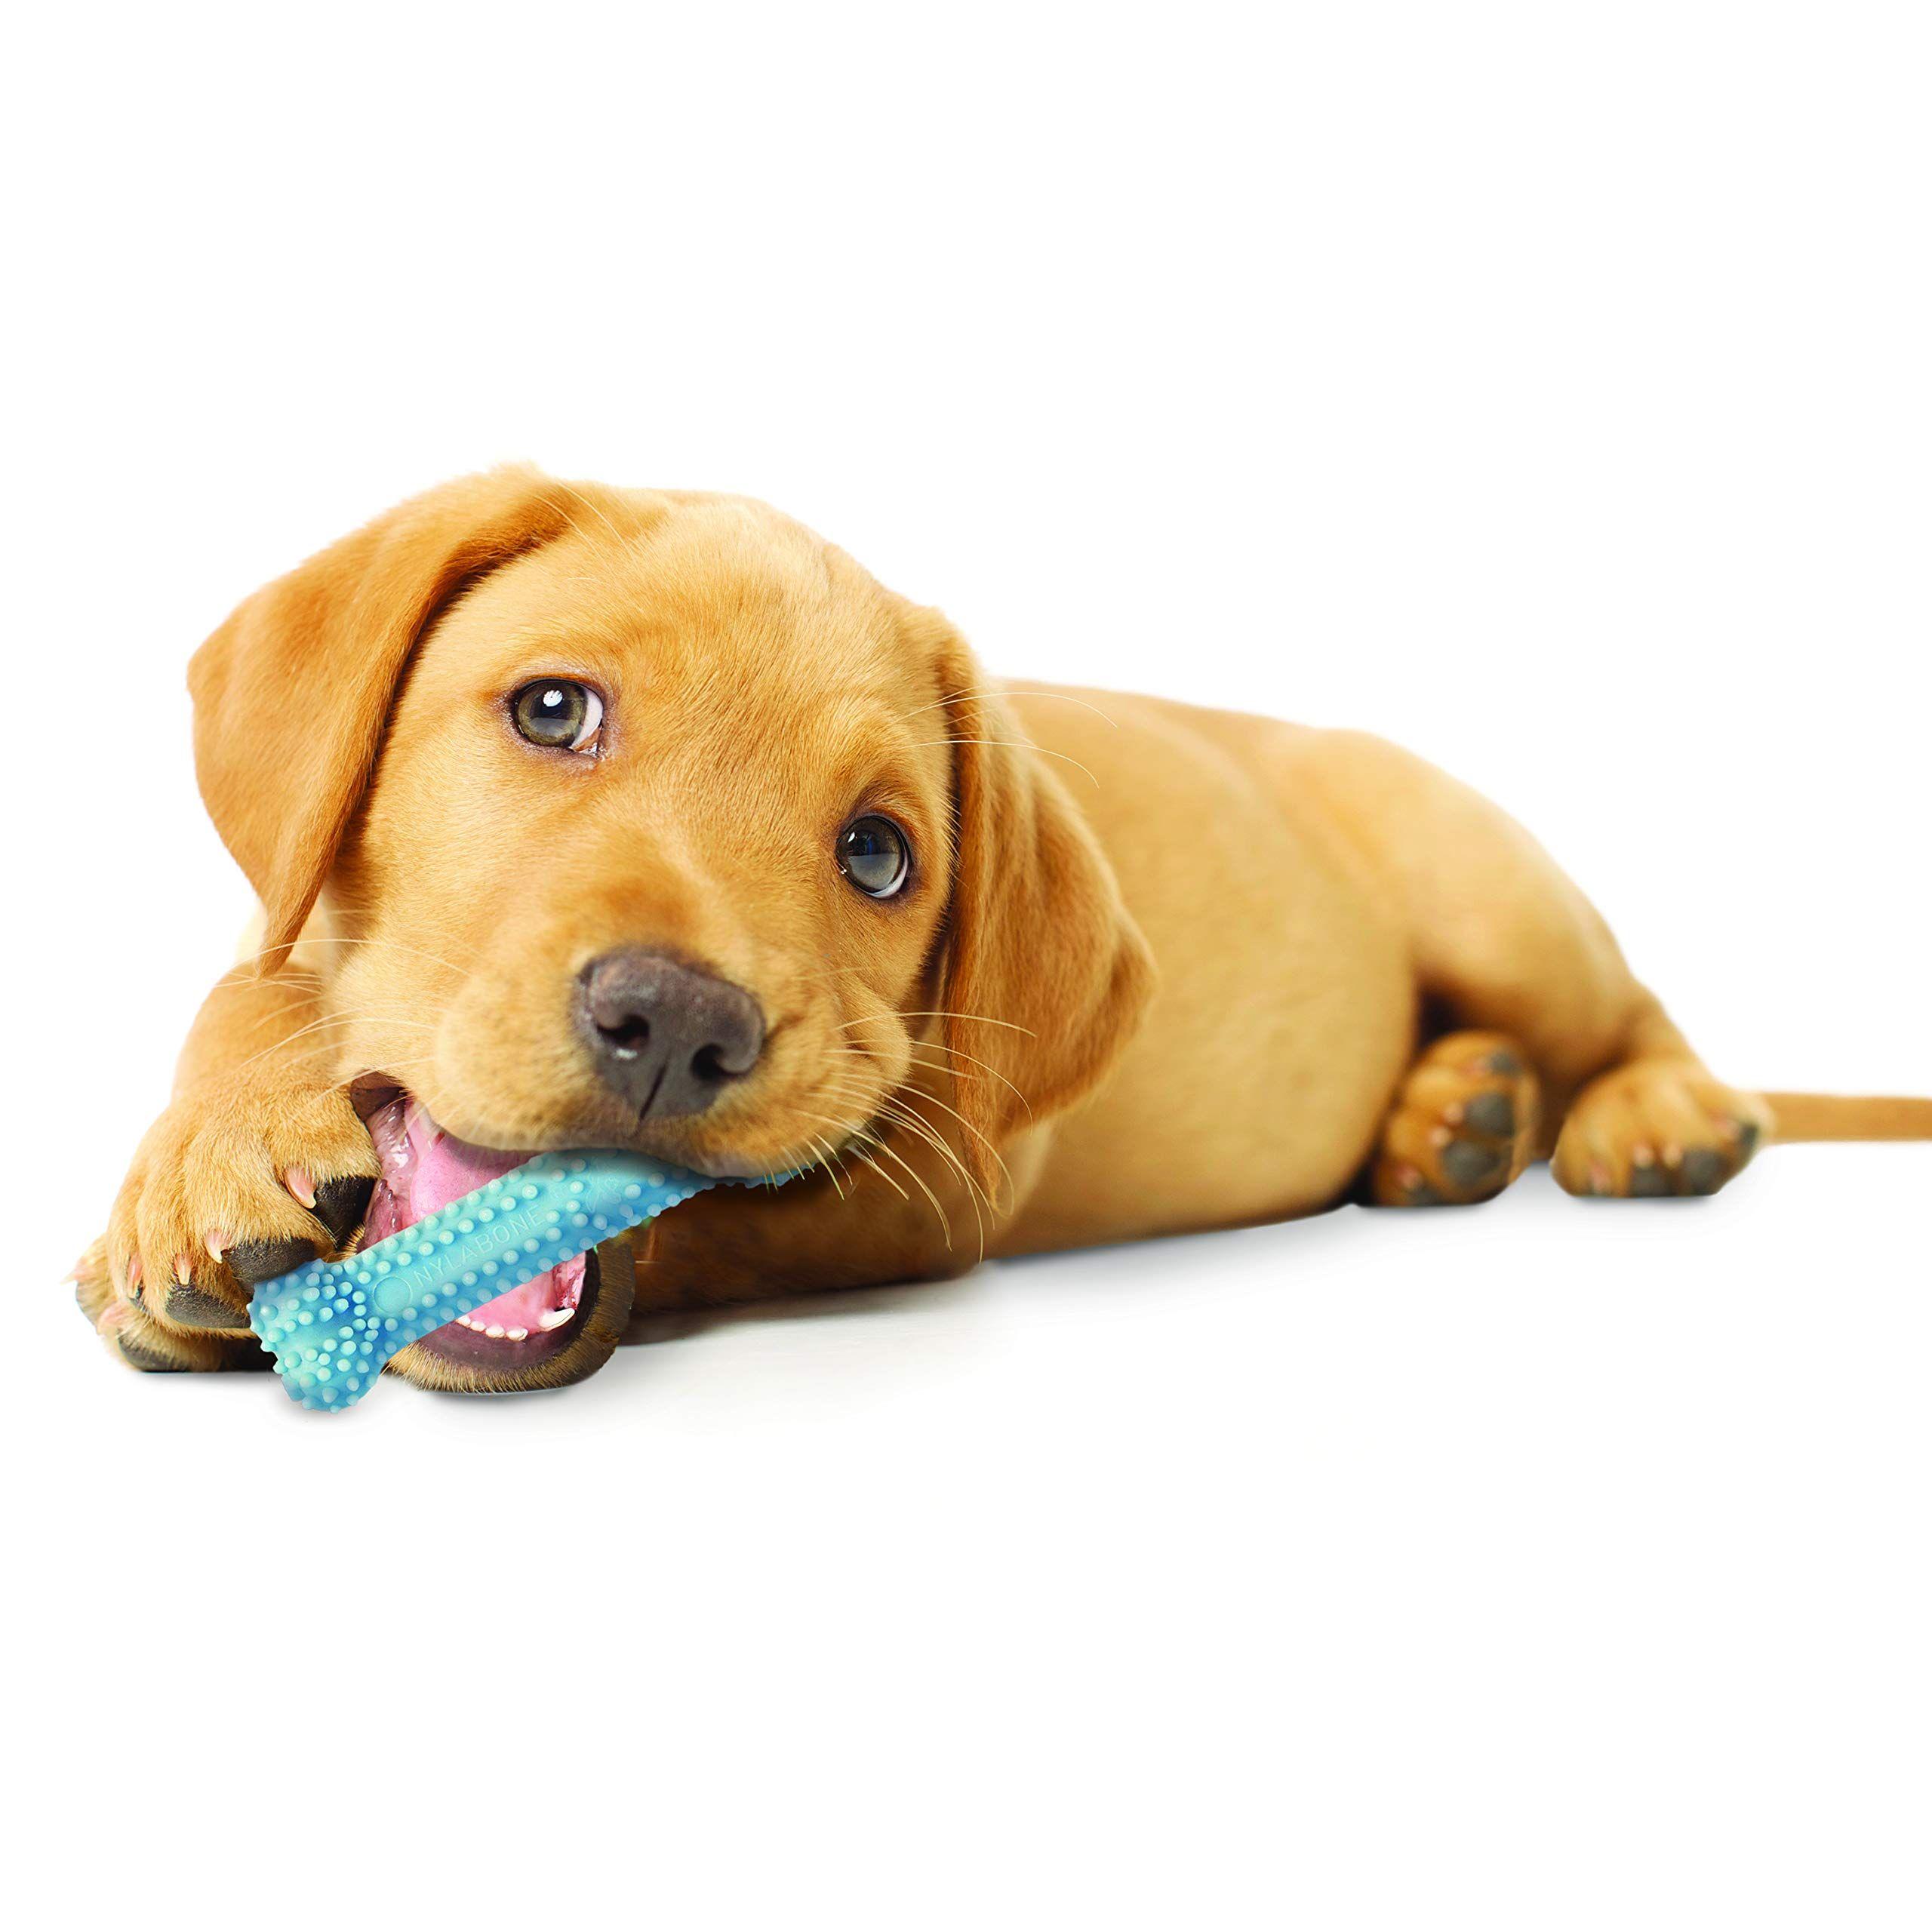 Nylabone Puppy Chew Toy Petite Puppy Nylabone Chew Petite